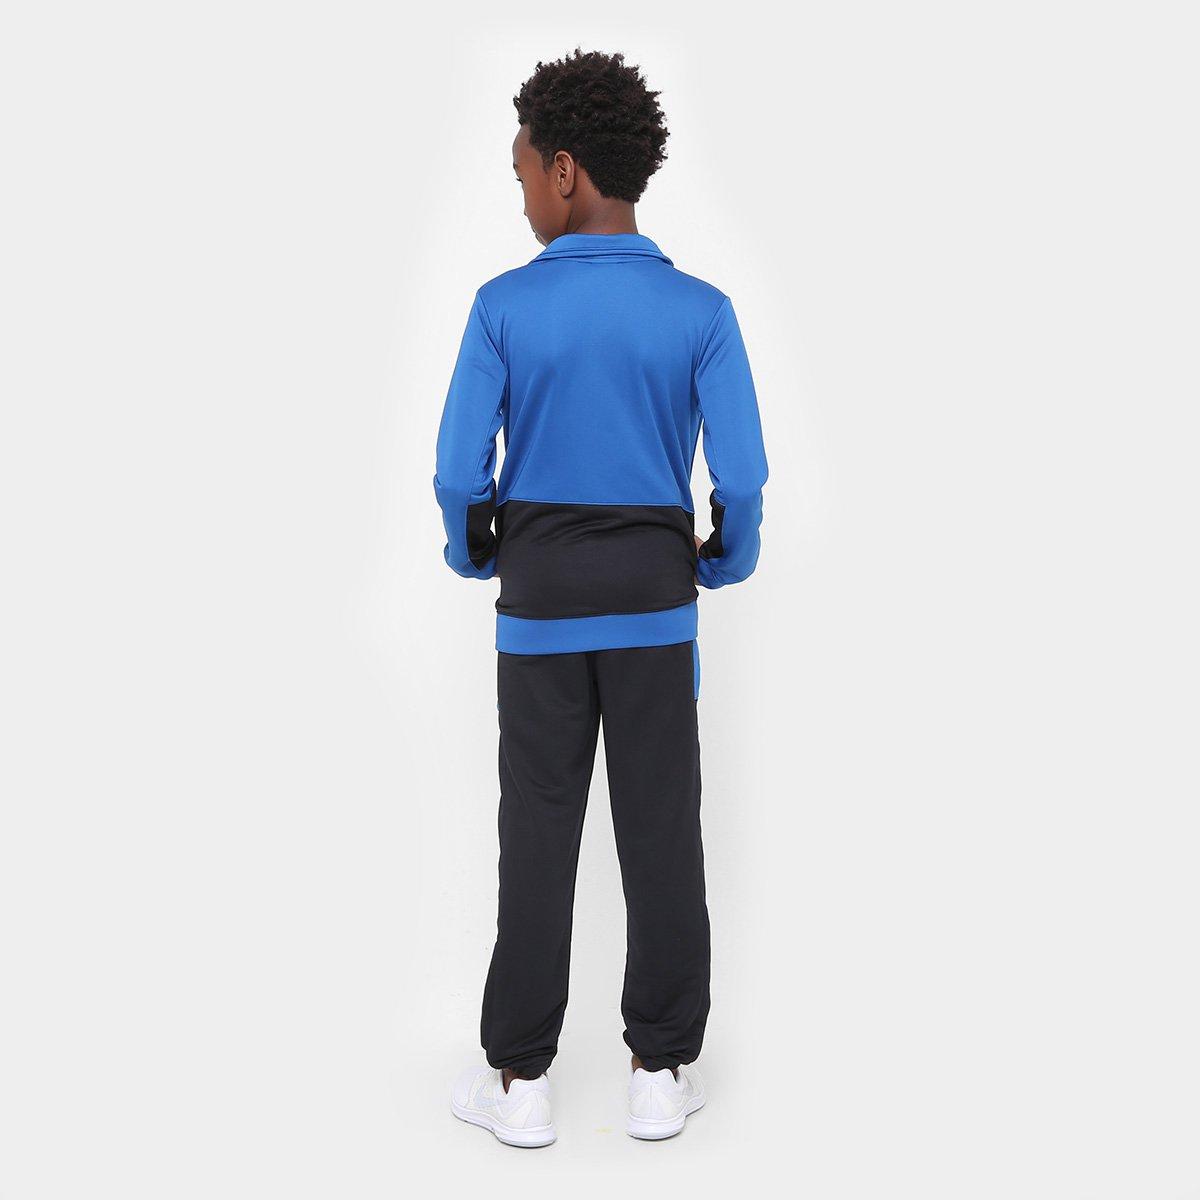 Agasalho Infantil Nike Nsw Trk Suit Pac Poly Masculino - Azul e ... d6e6cc1194e90